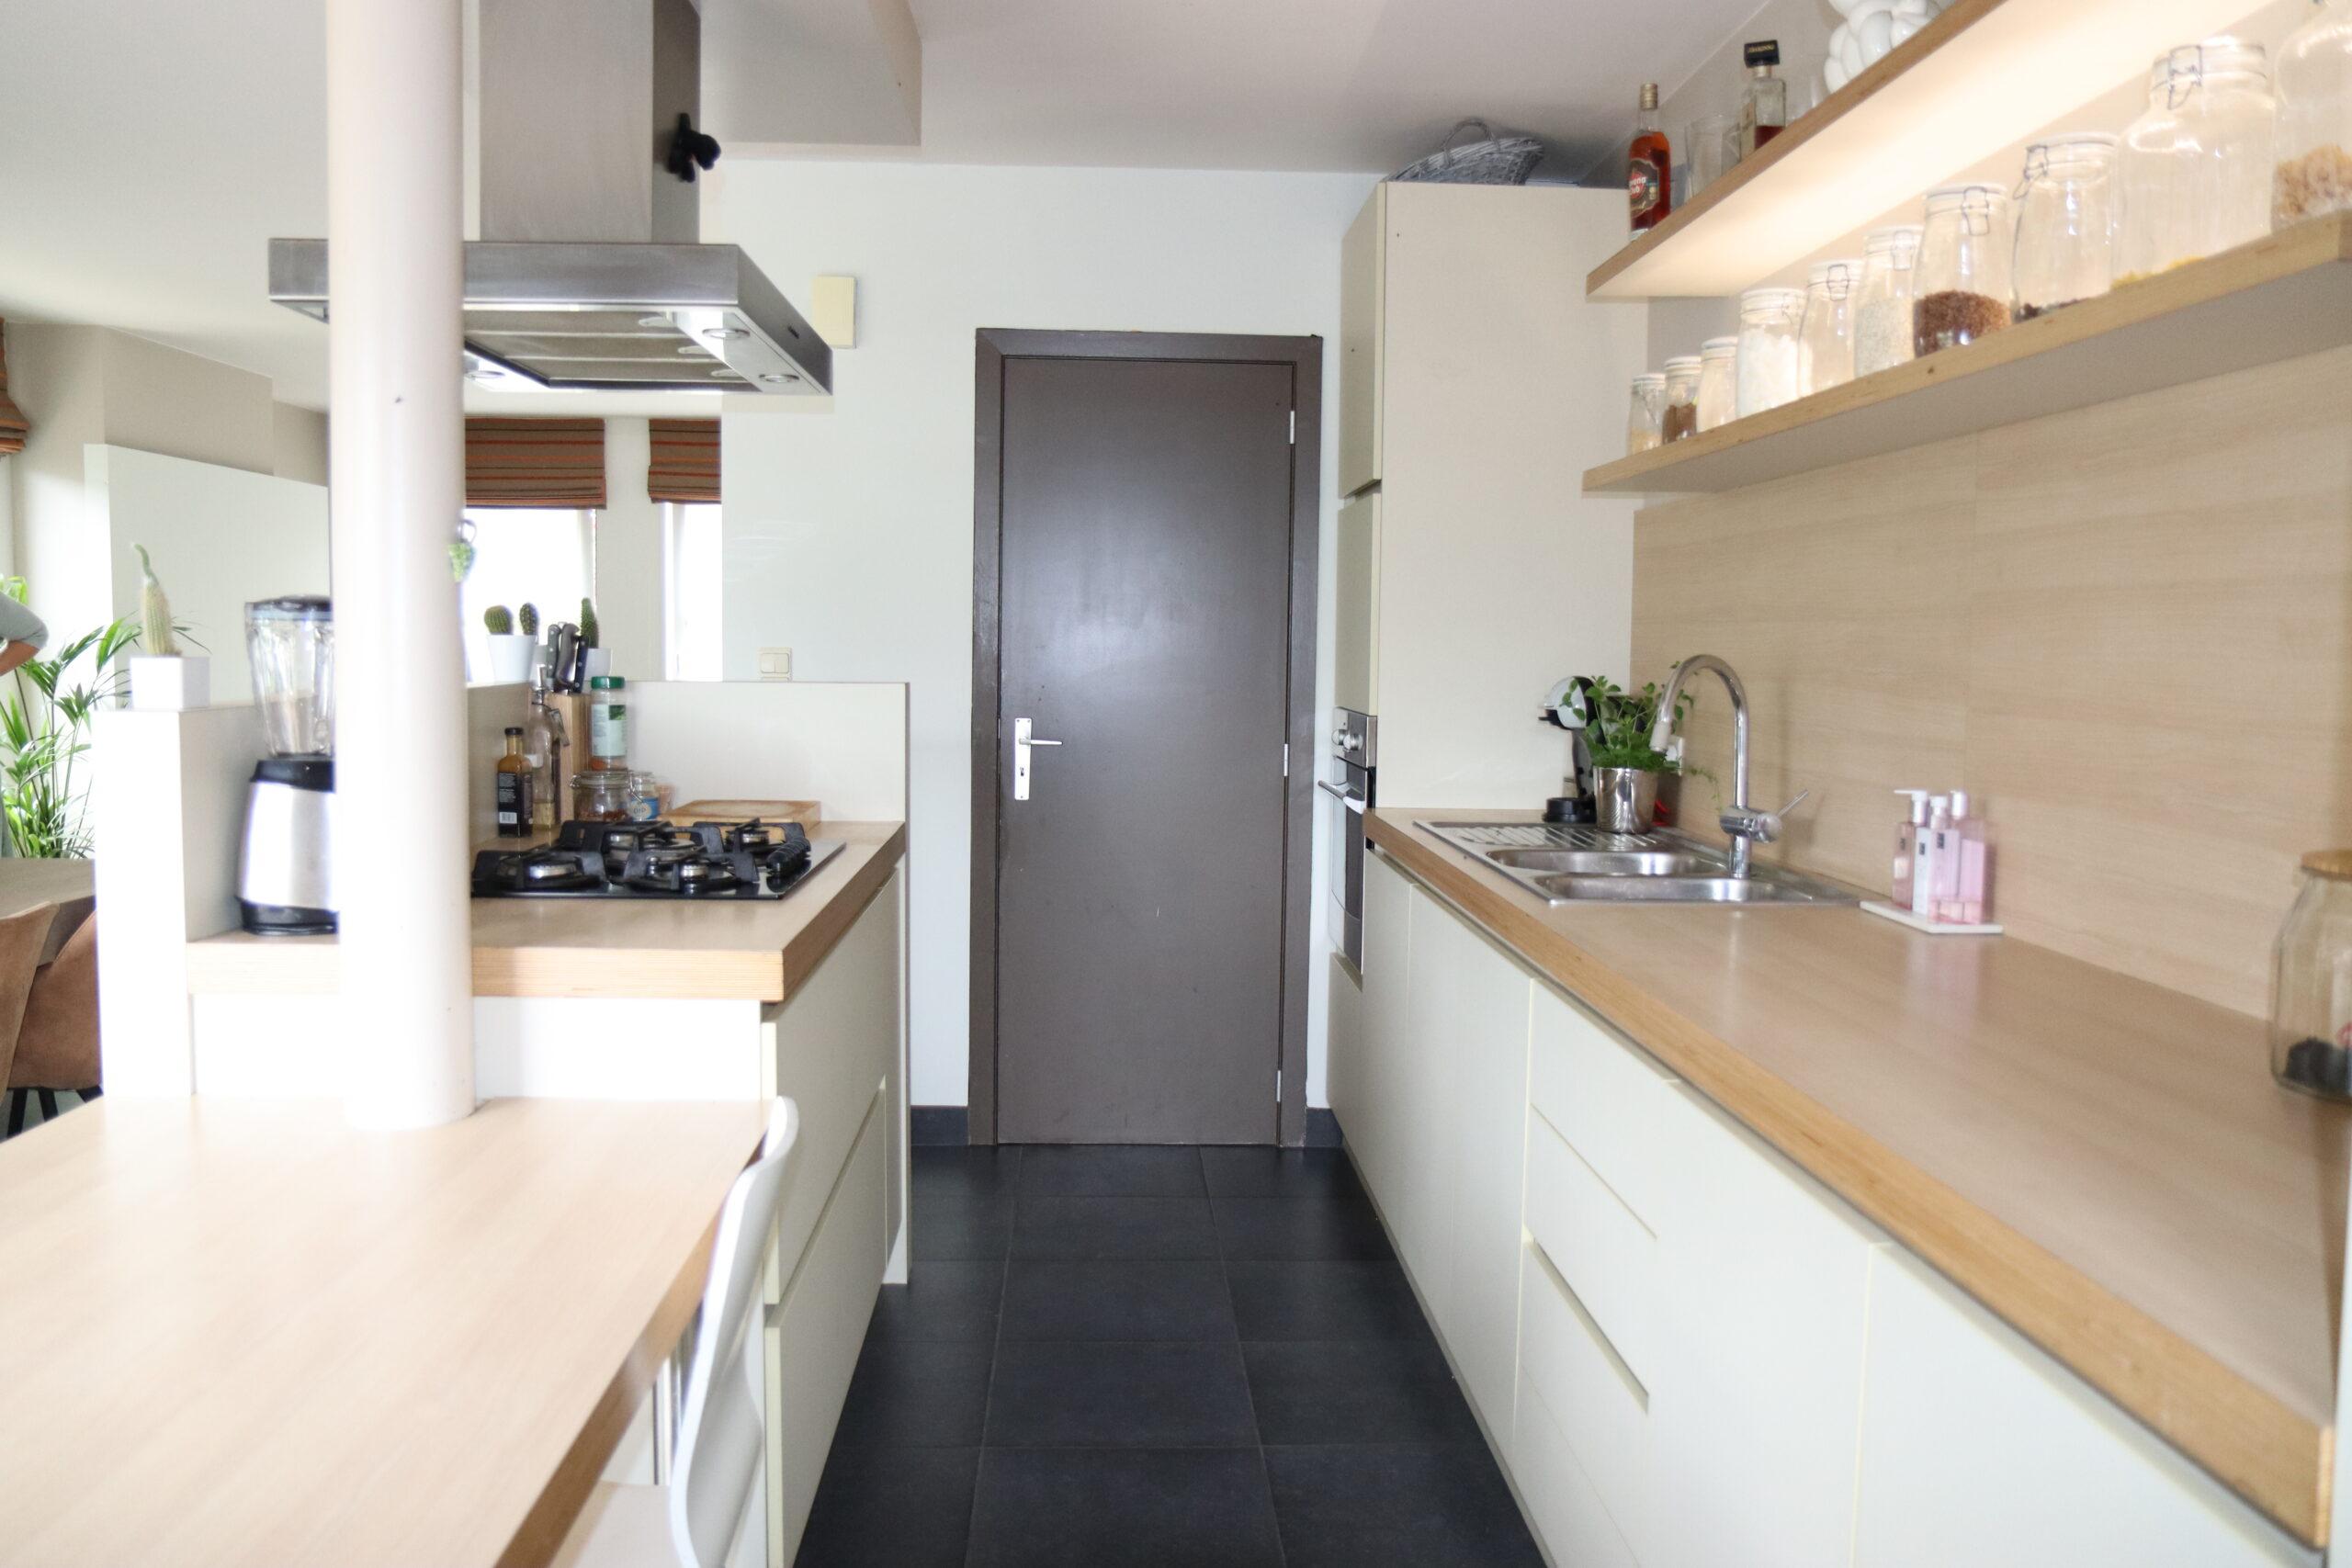 7 Keuken 3